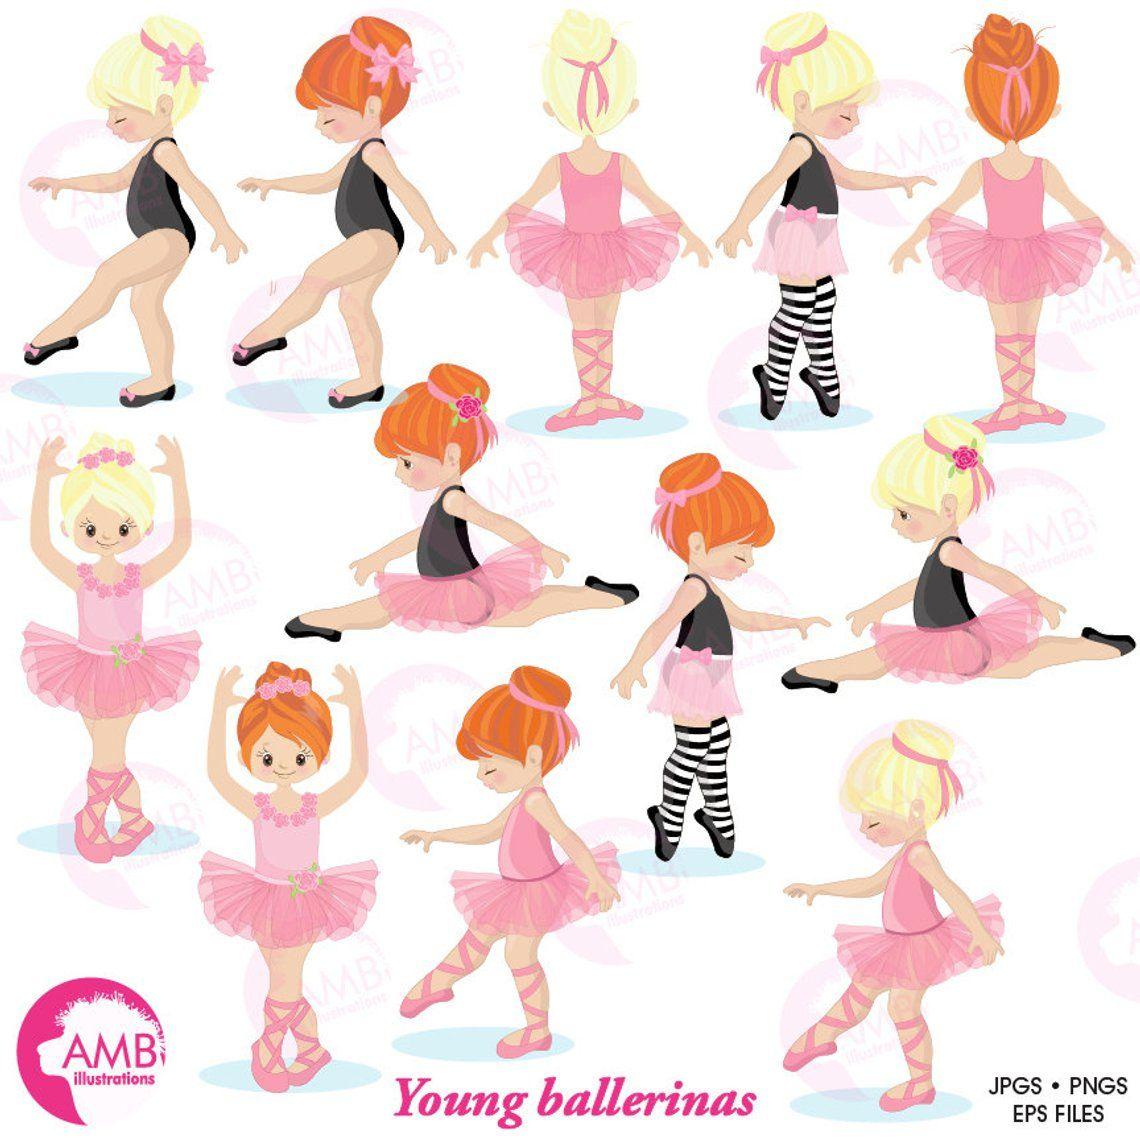 Ballerina clipart, Ballet clipart, pink ballerina, girl